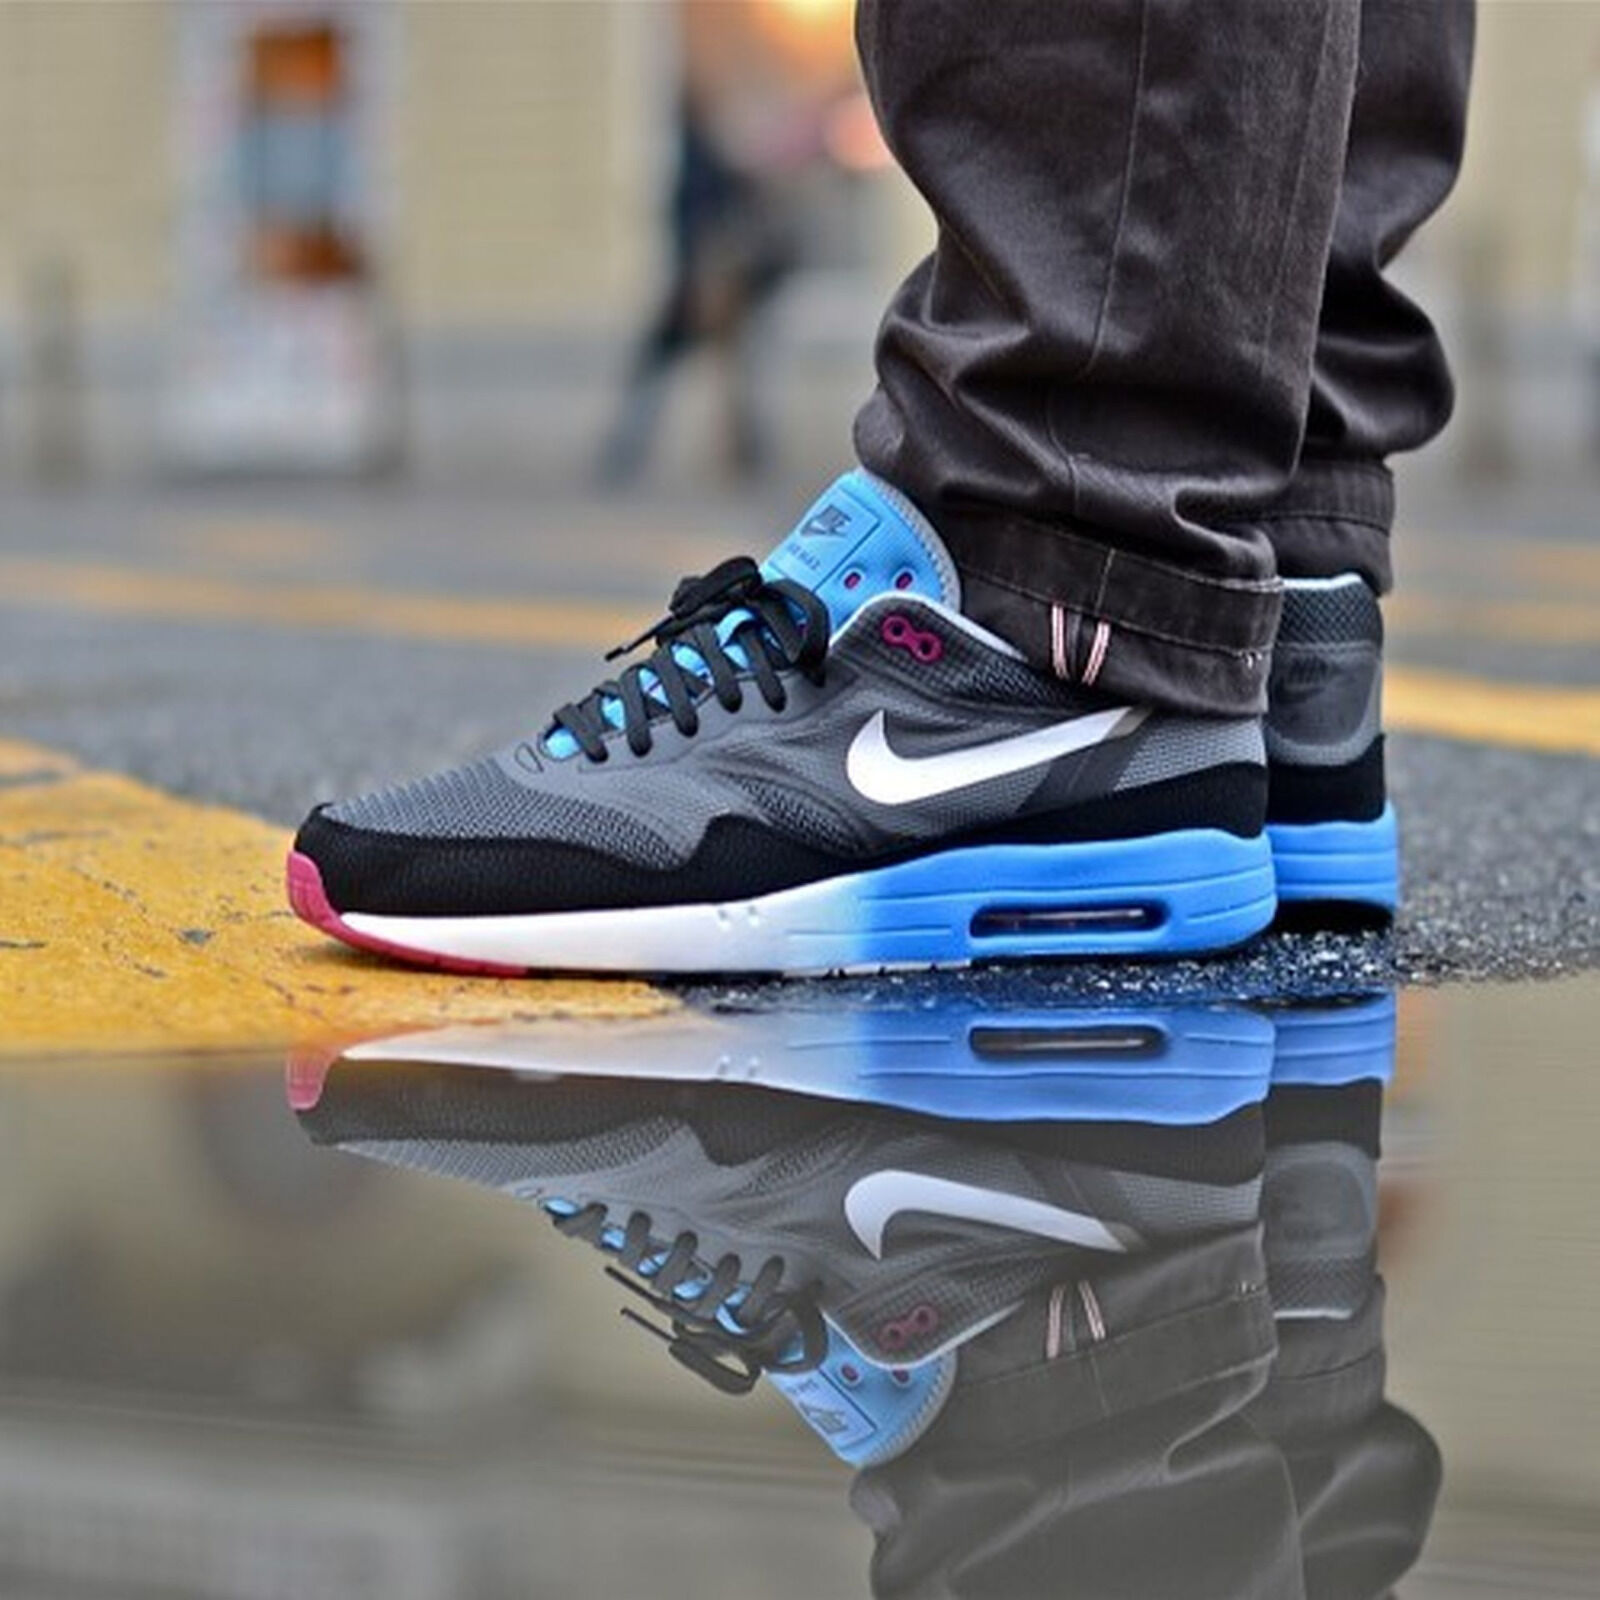 Nike Air Max 1 C2.0 Running Shoe size 11.5 631738-001 Mens Black White Dark Grey